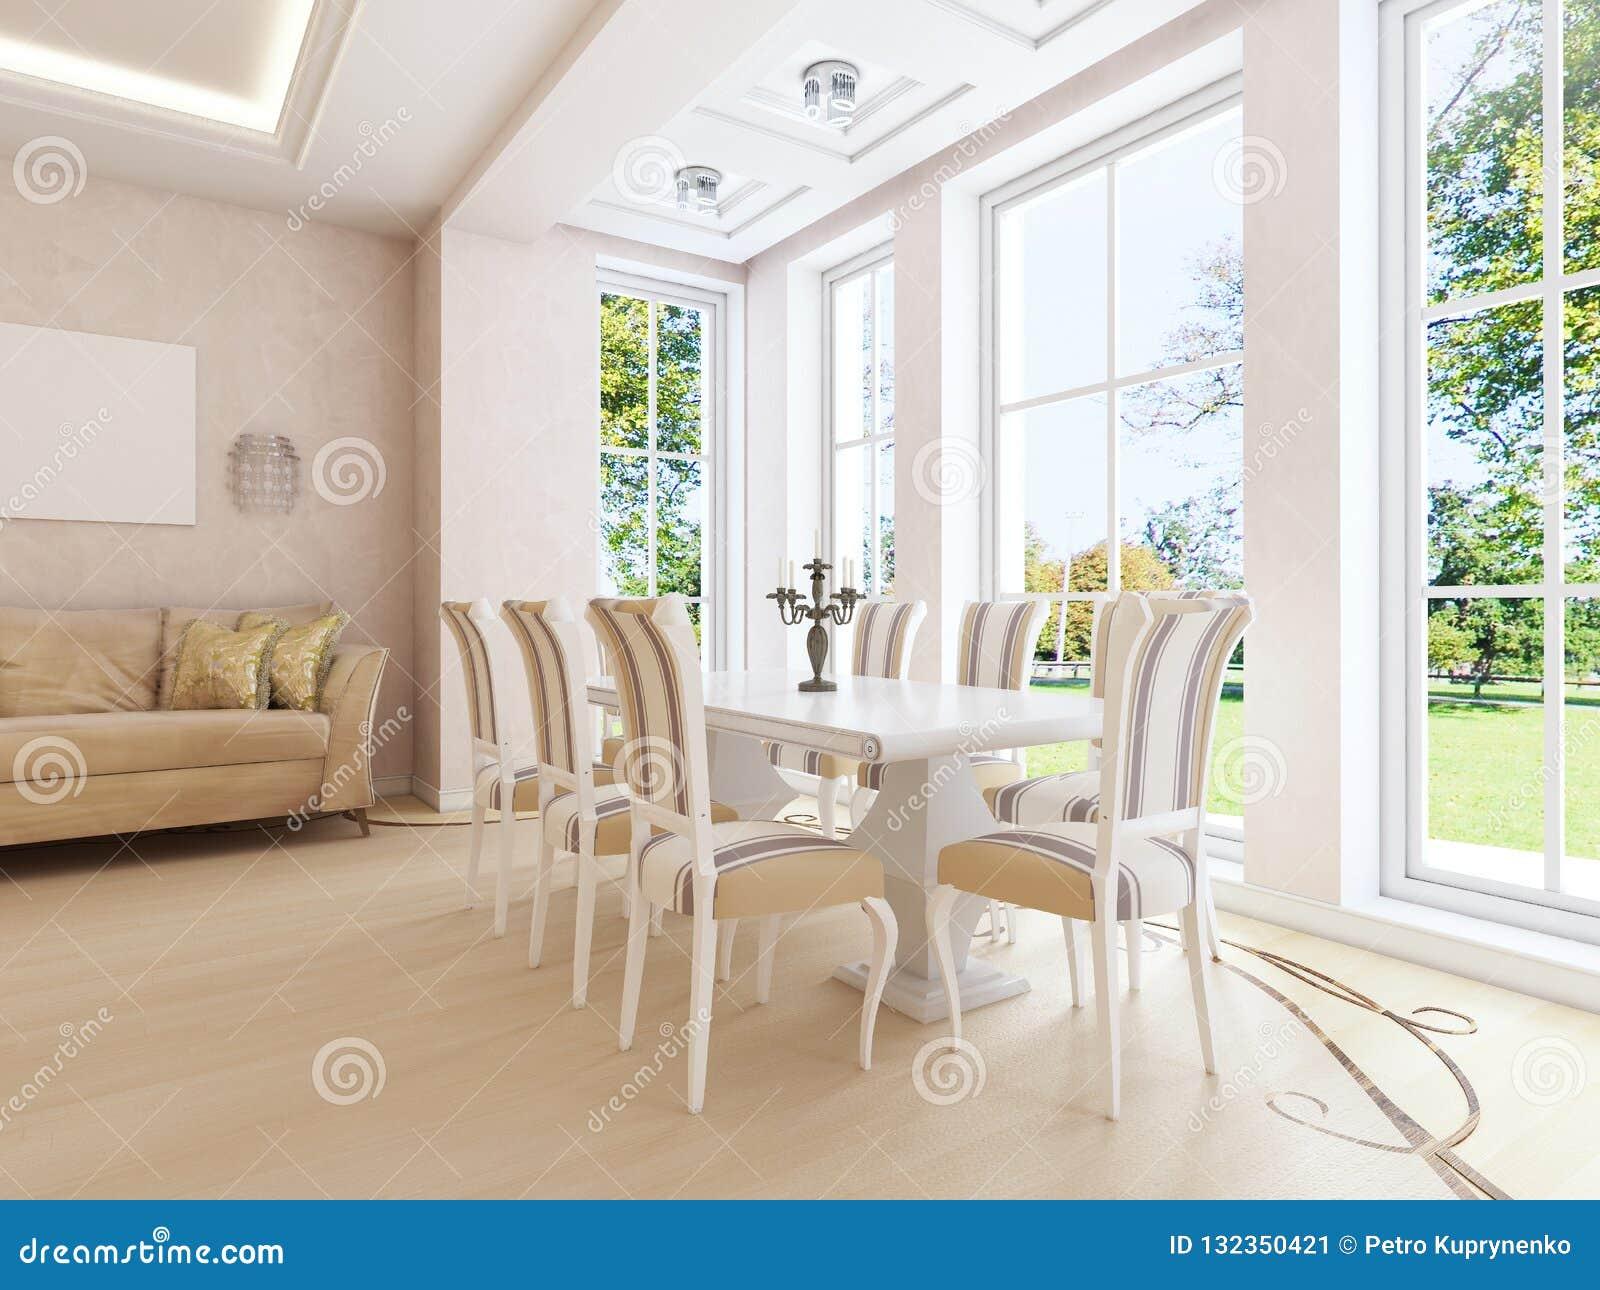 light living room light classical style art deco elements dining table window light living room light image